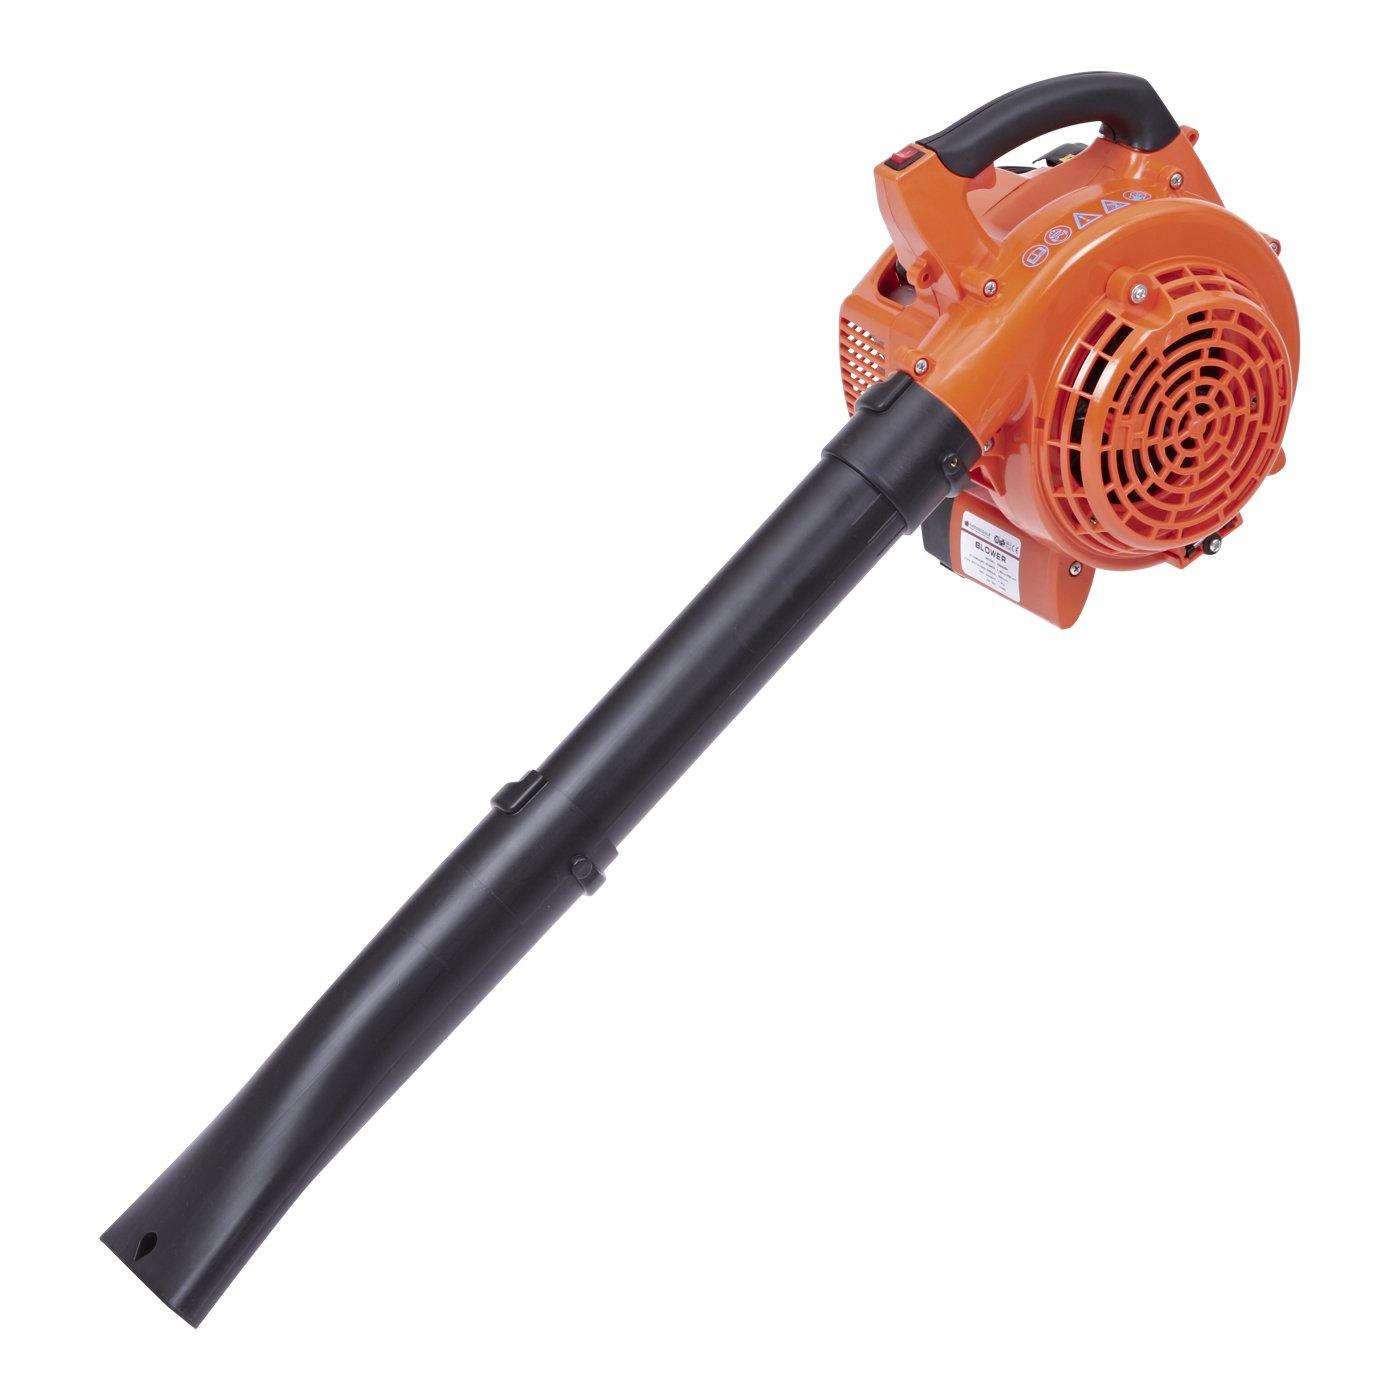 Trueshopping 26cc Petrol Leaf Blower Garden Cordless Vac Cleaner Vacuum Powerful Hand Held 0.75KW